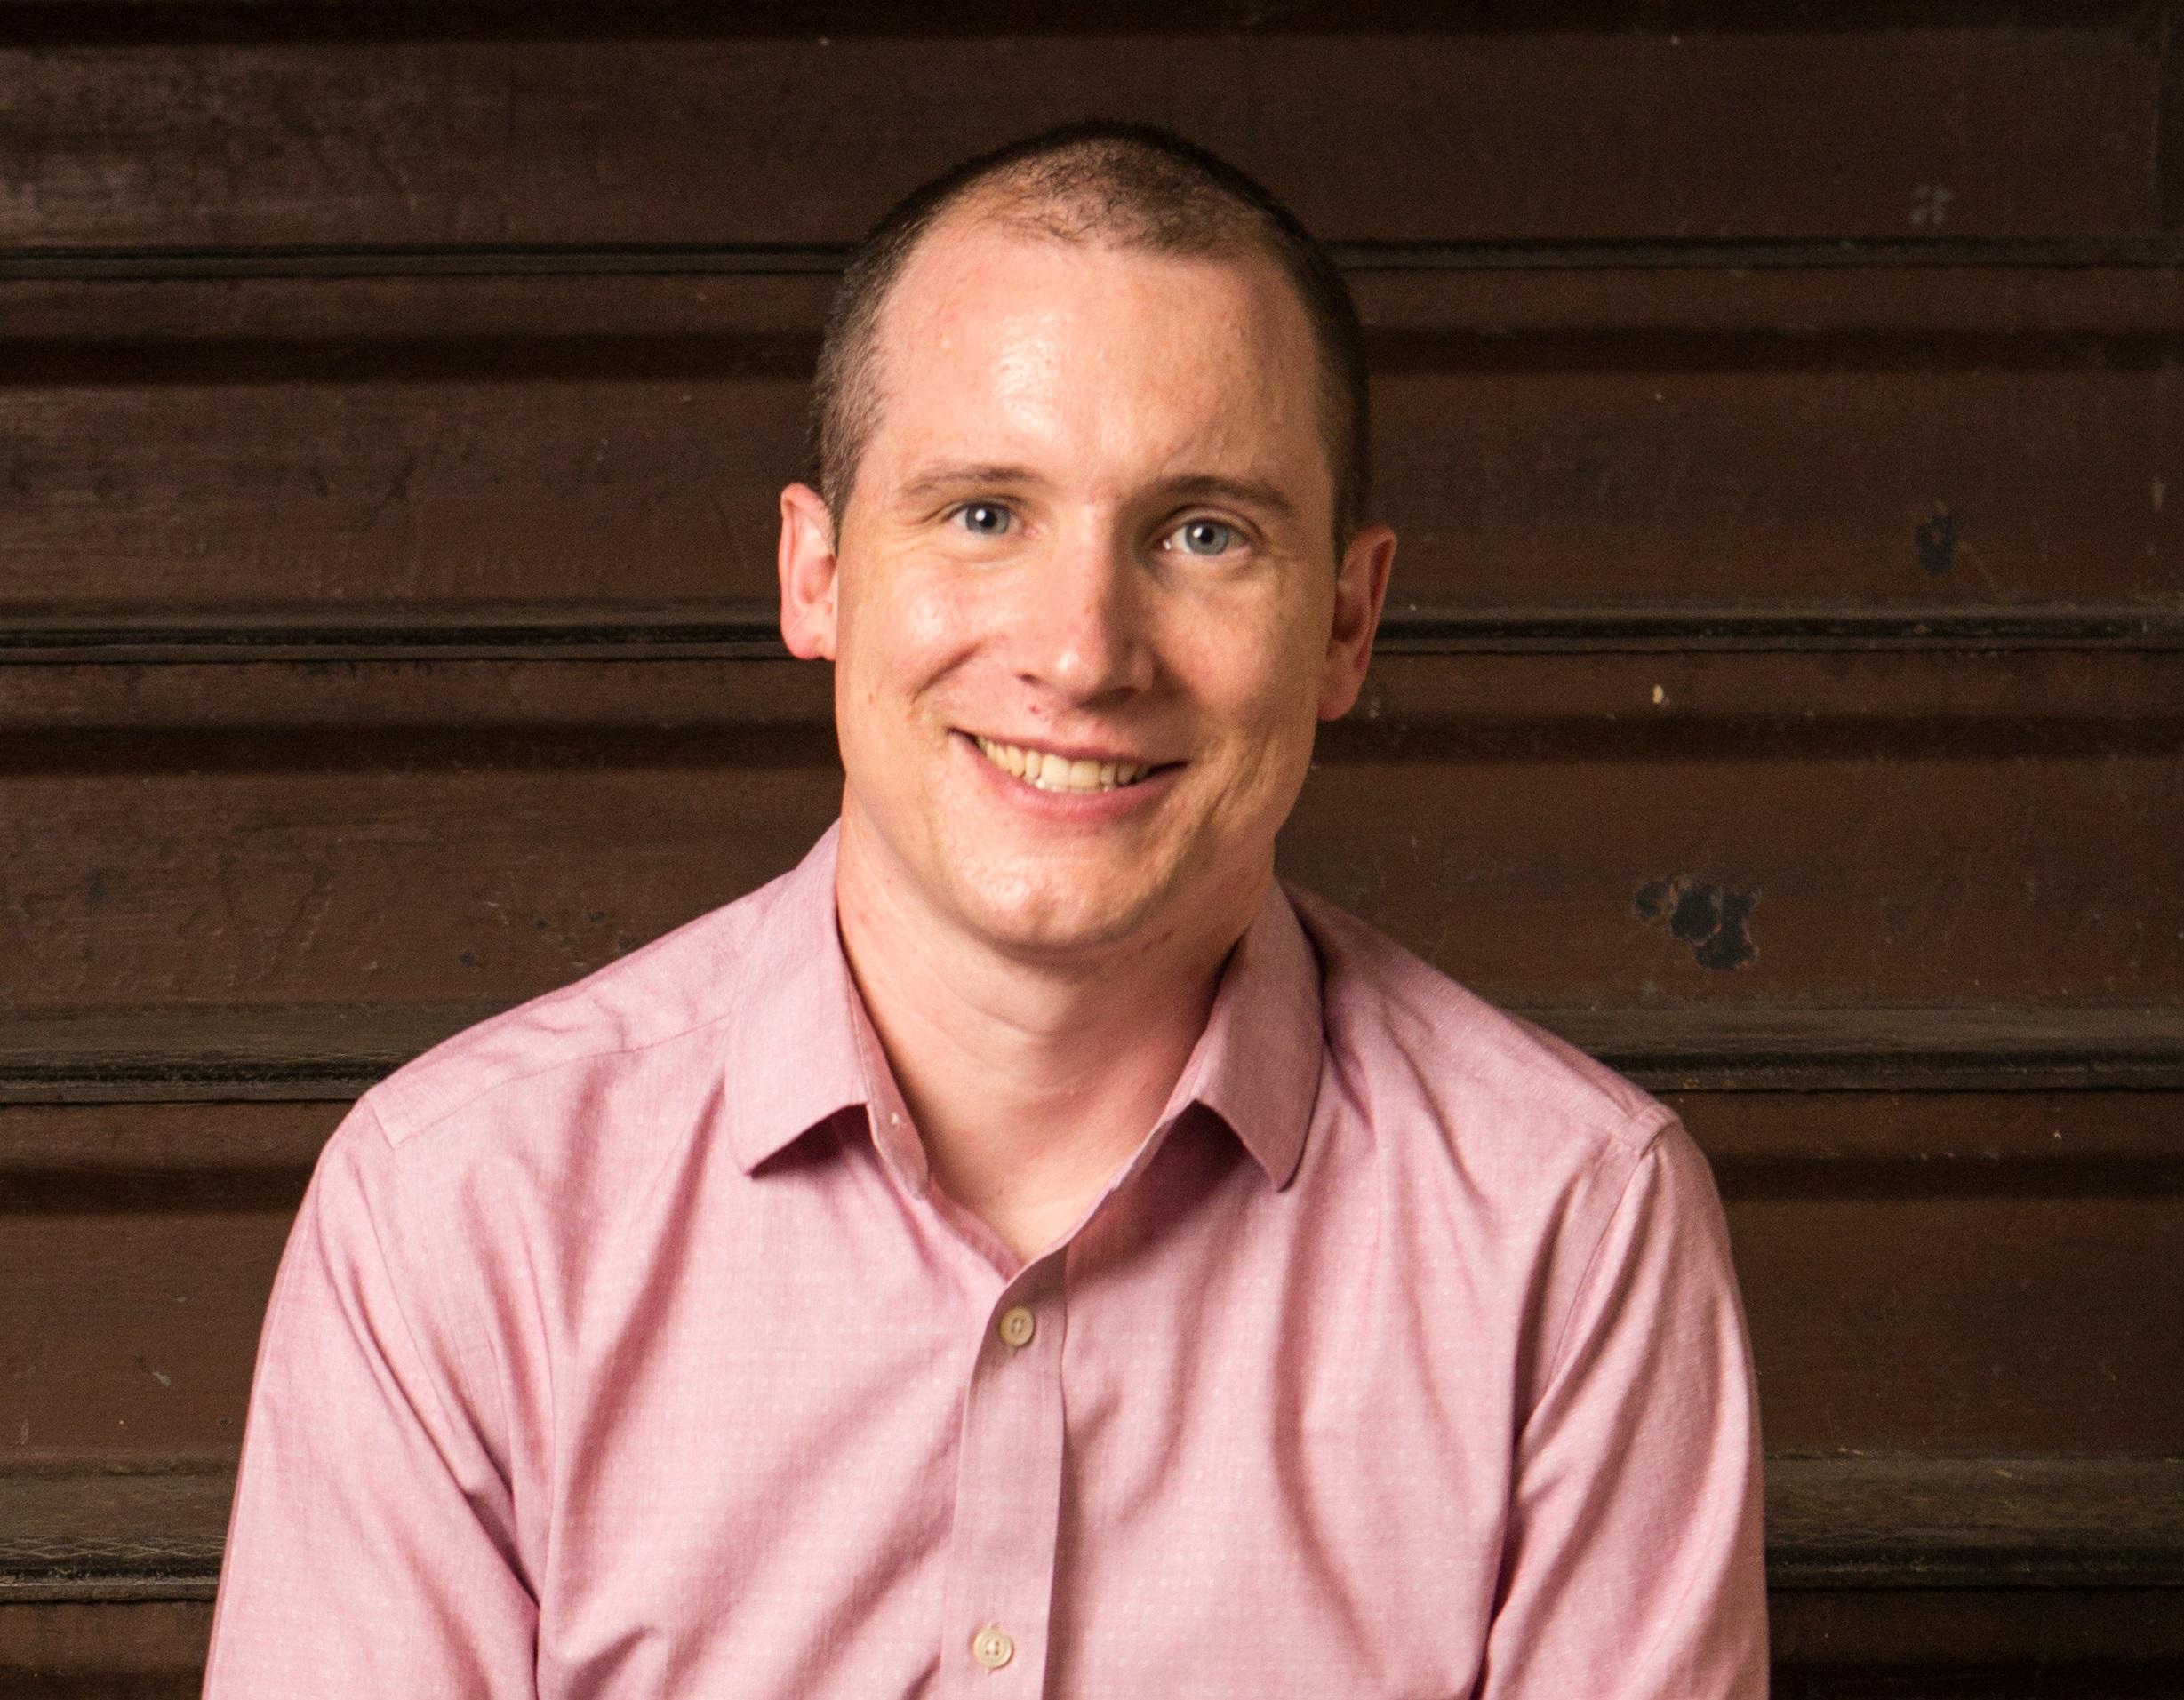 McAllister author photo cropped